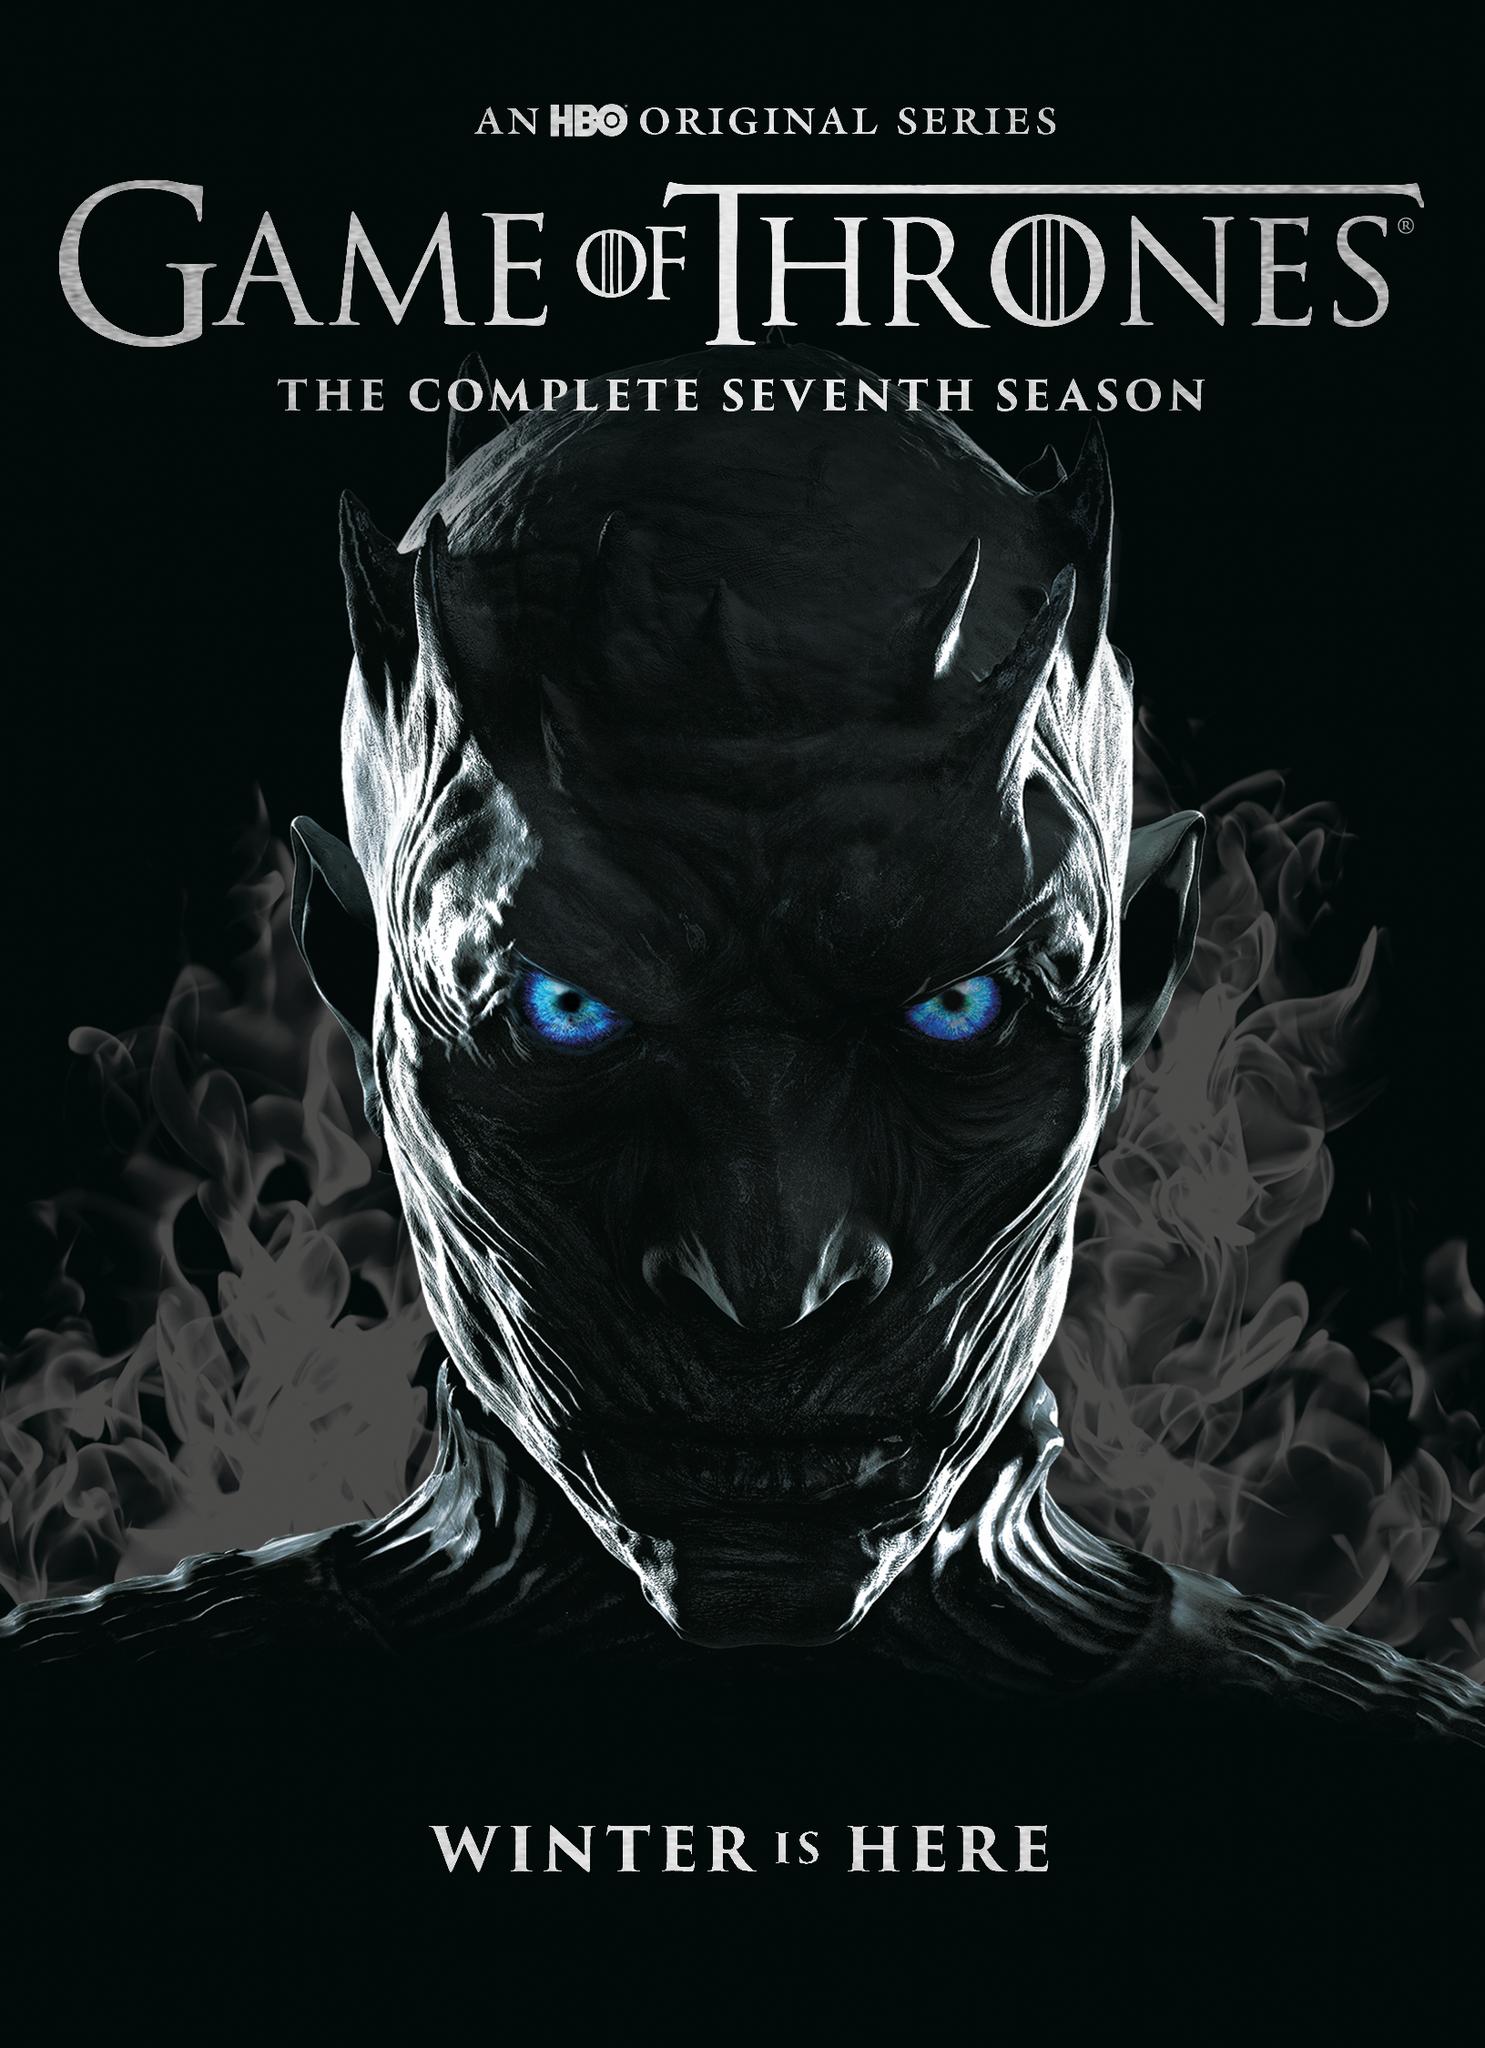 Game Of Thrones S07 FULL 2017 | WEB-DL 1080p مترجم -- Seeders: 2 -- Leechers: 0